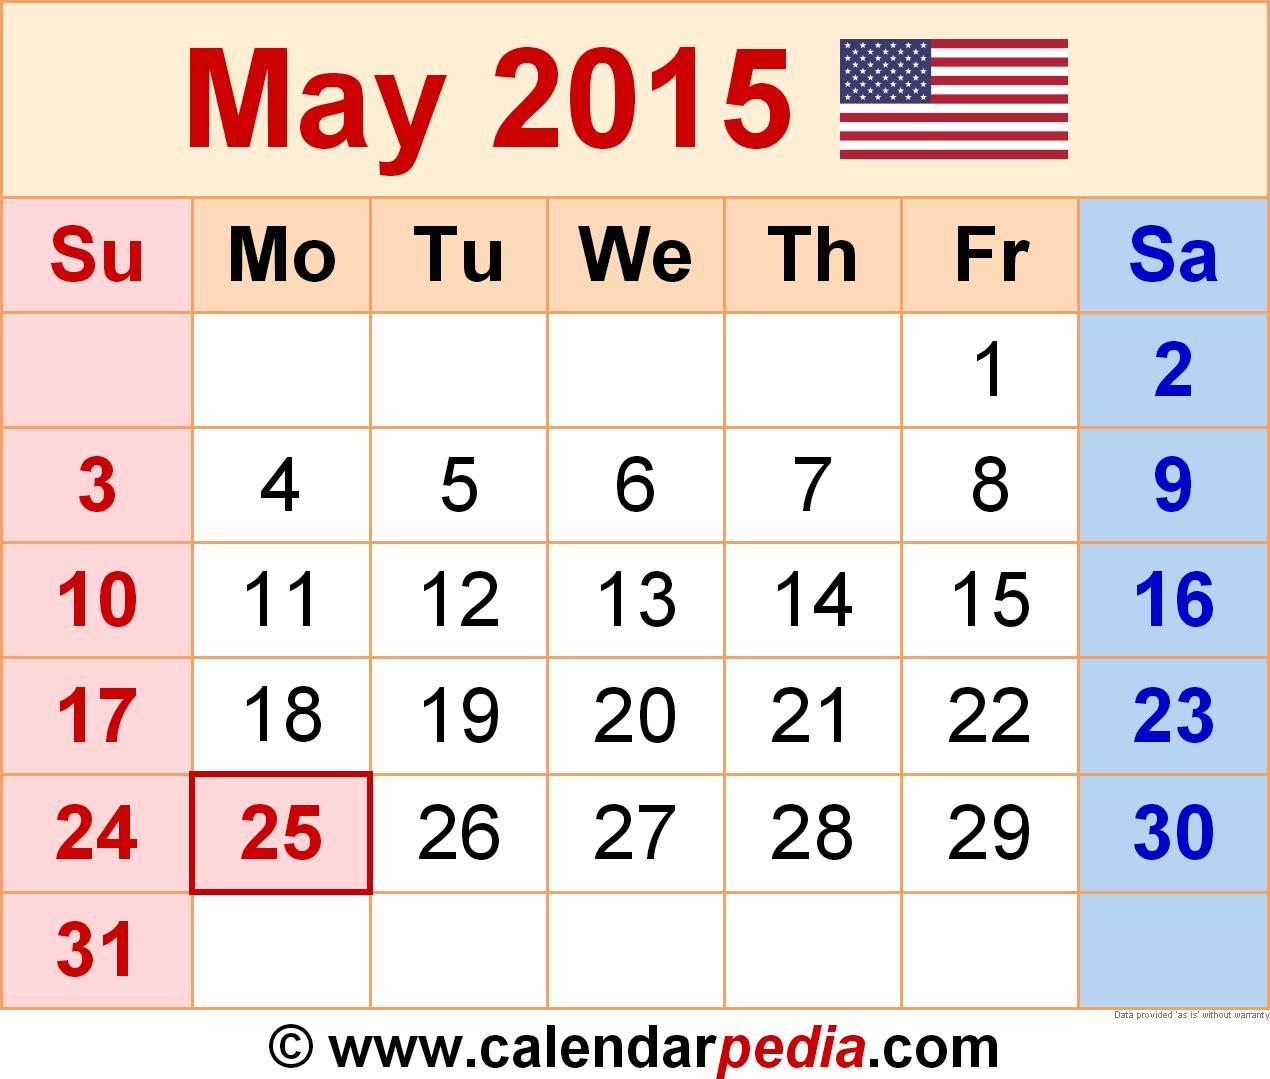 Calendar 2015 Template Monthly from www.calendarpedia.com